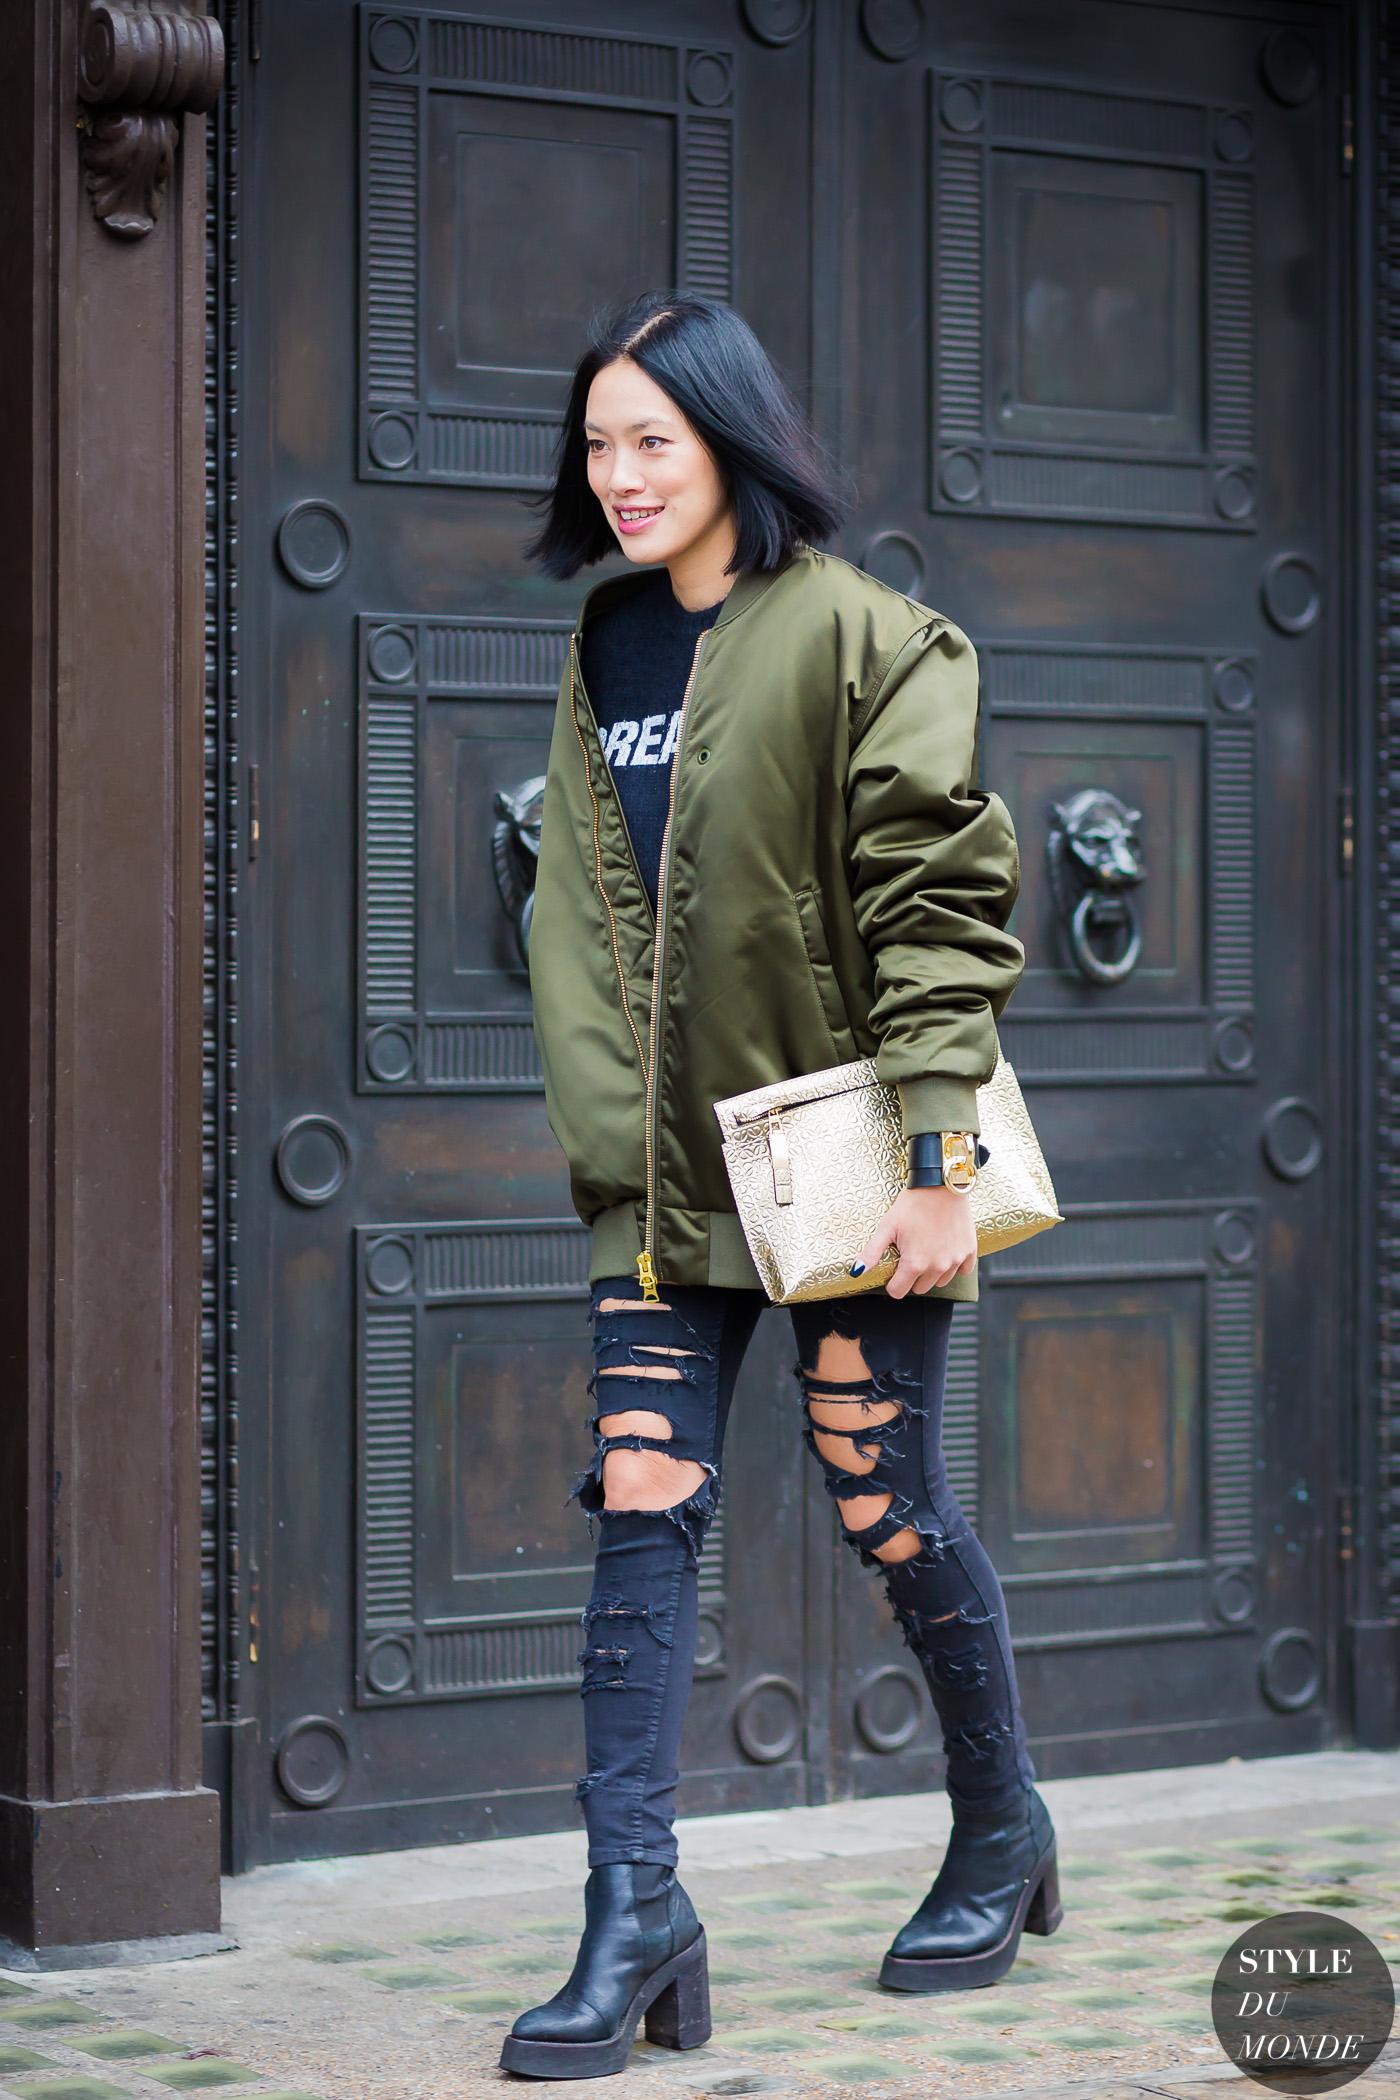 3cb7e08fa Tiffany Hsu Street Style Street Fashion Streetsnaps by STYLEDUMONDE Street  Style Fashion Photography